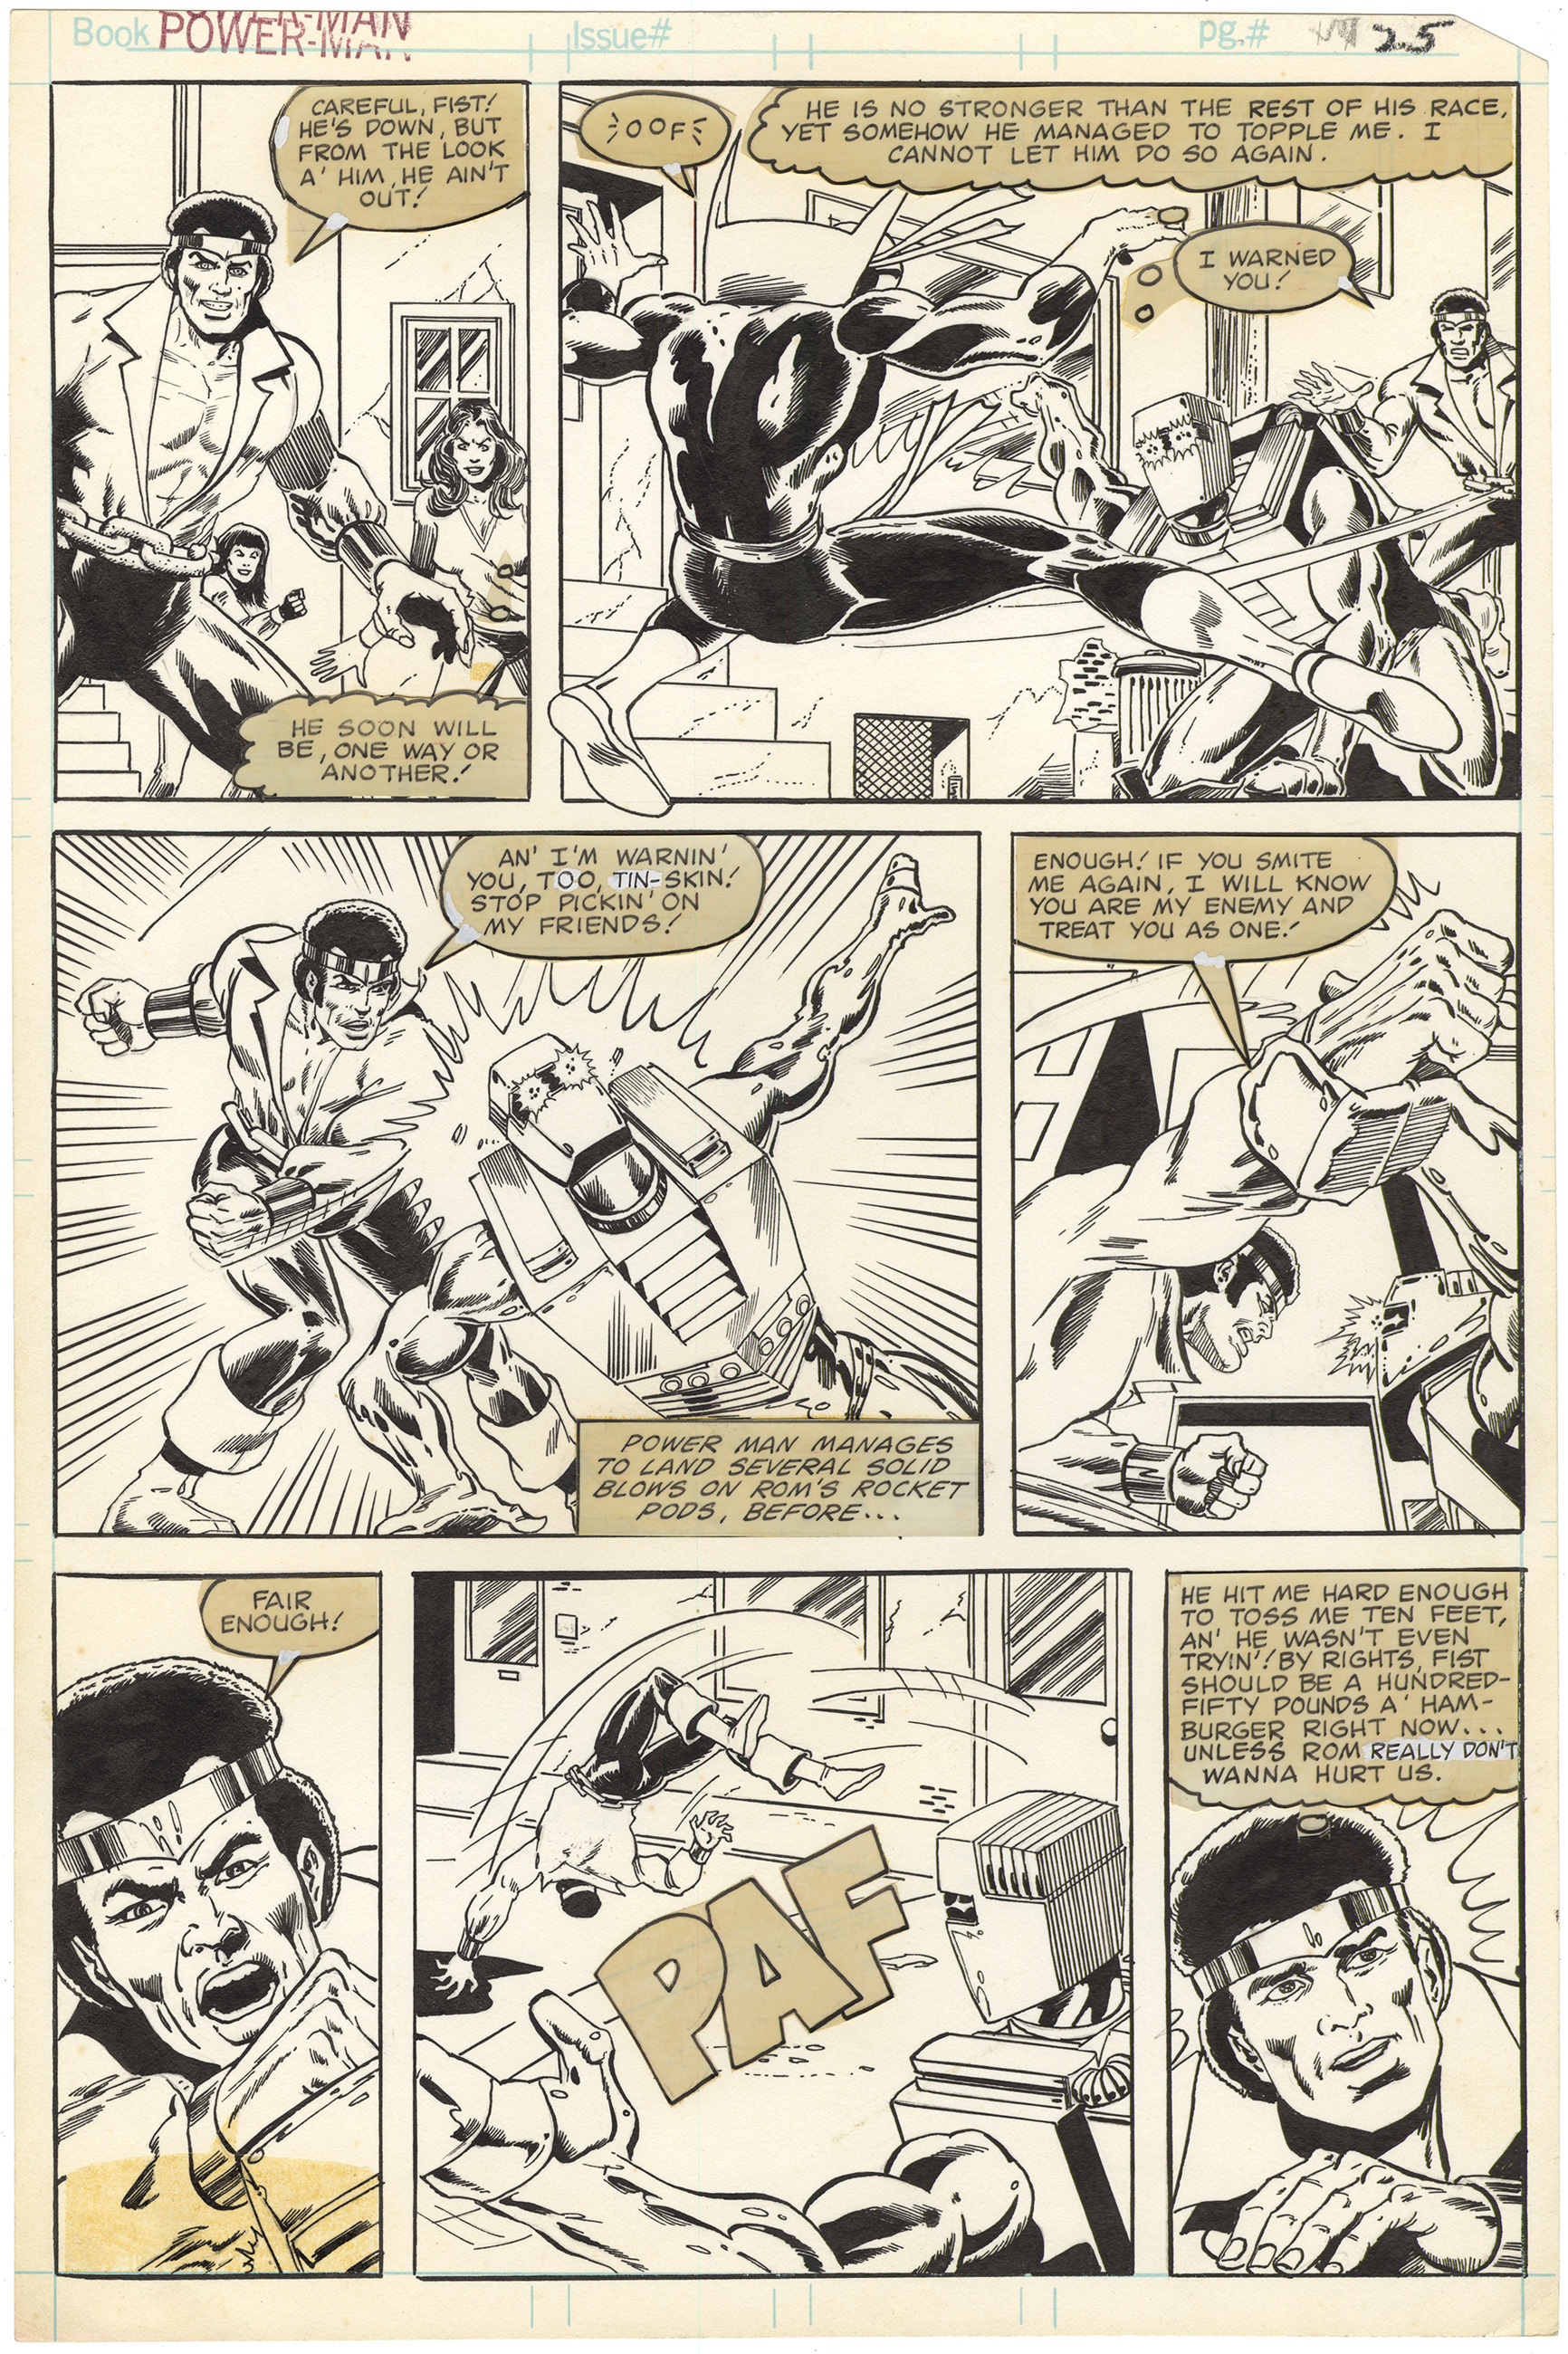 Power Man #73 p25